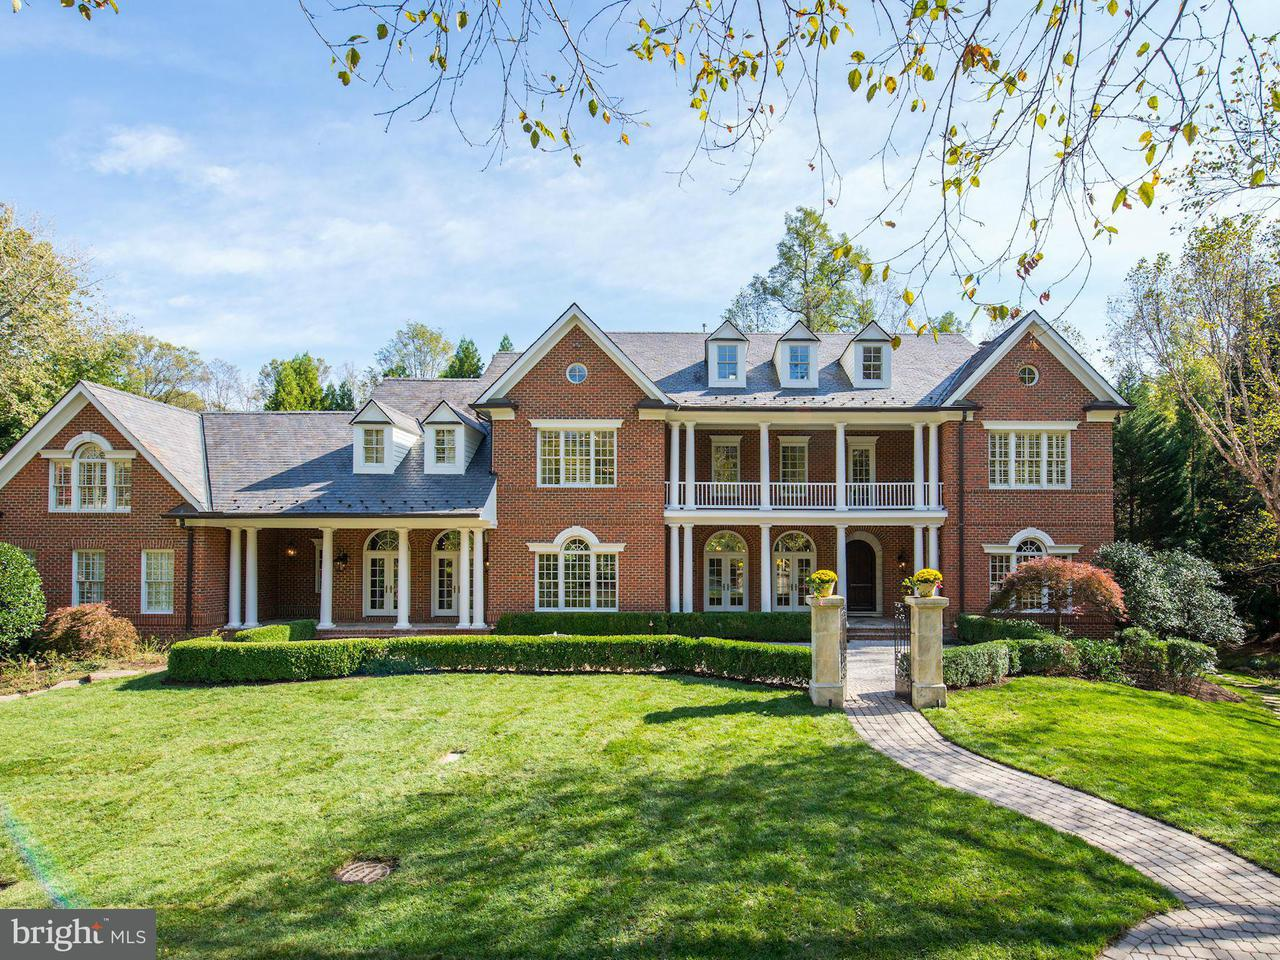 Single Family Home for Sale at 1091 LANGLEY FORK Lane 1091 LANGLEY FORK Lane McLean, Virginia 22101 United States